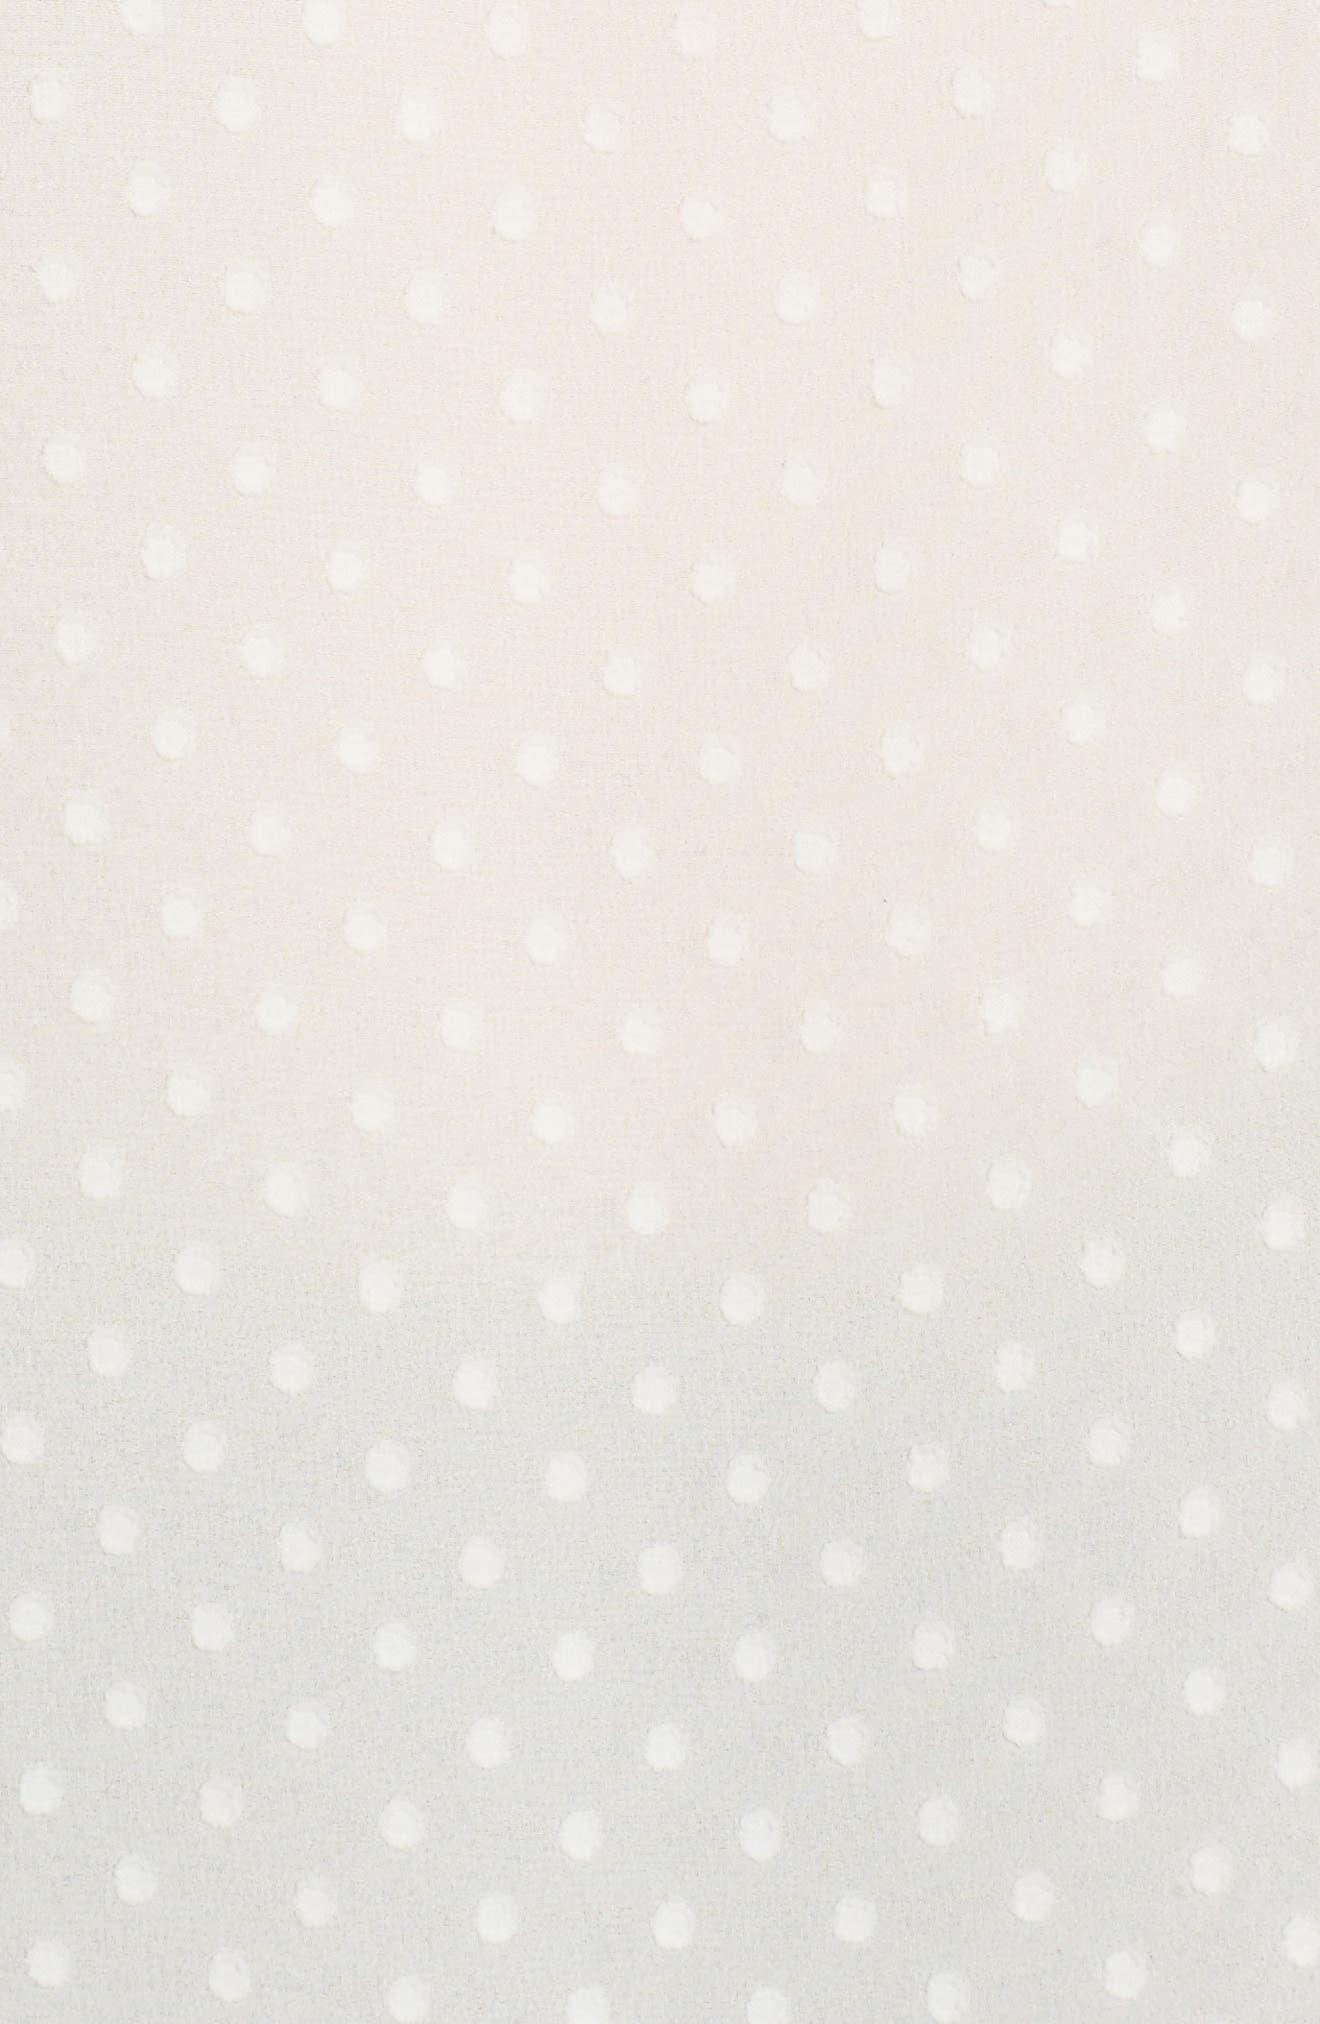 Double Ruffle Blouse,                             Alternate thumbnail 5, color,                             Ivory Pristine